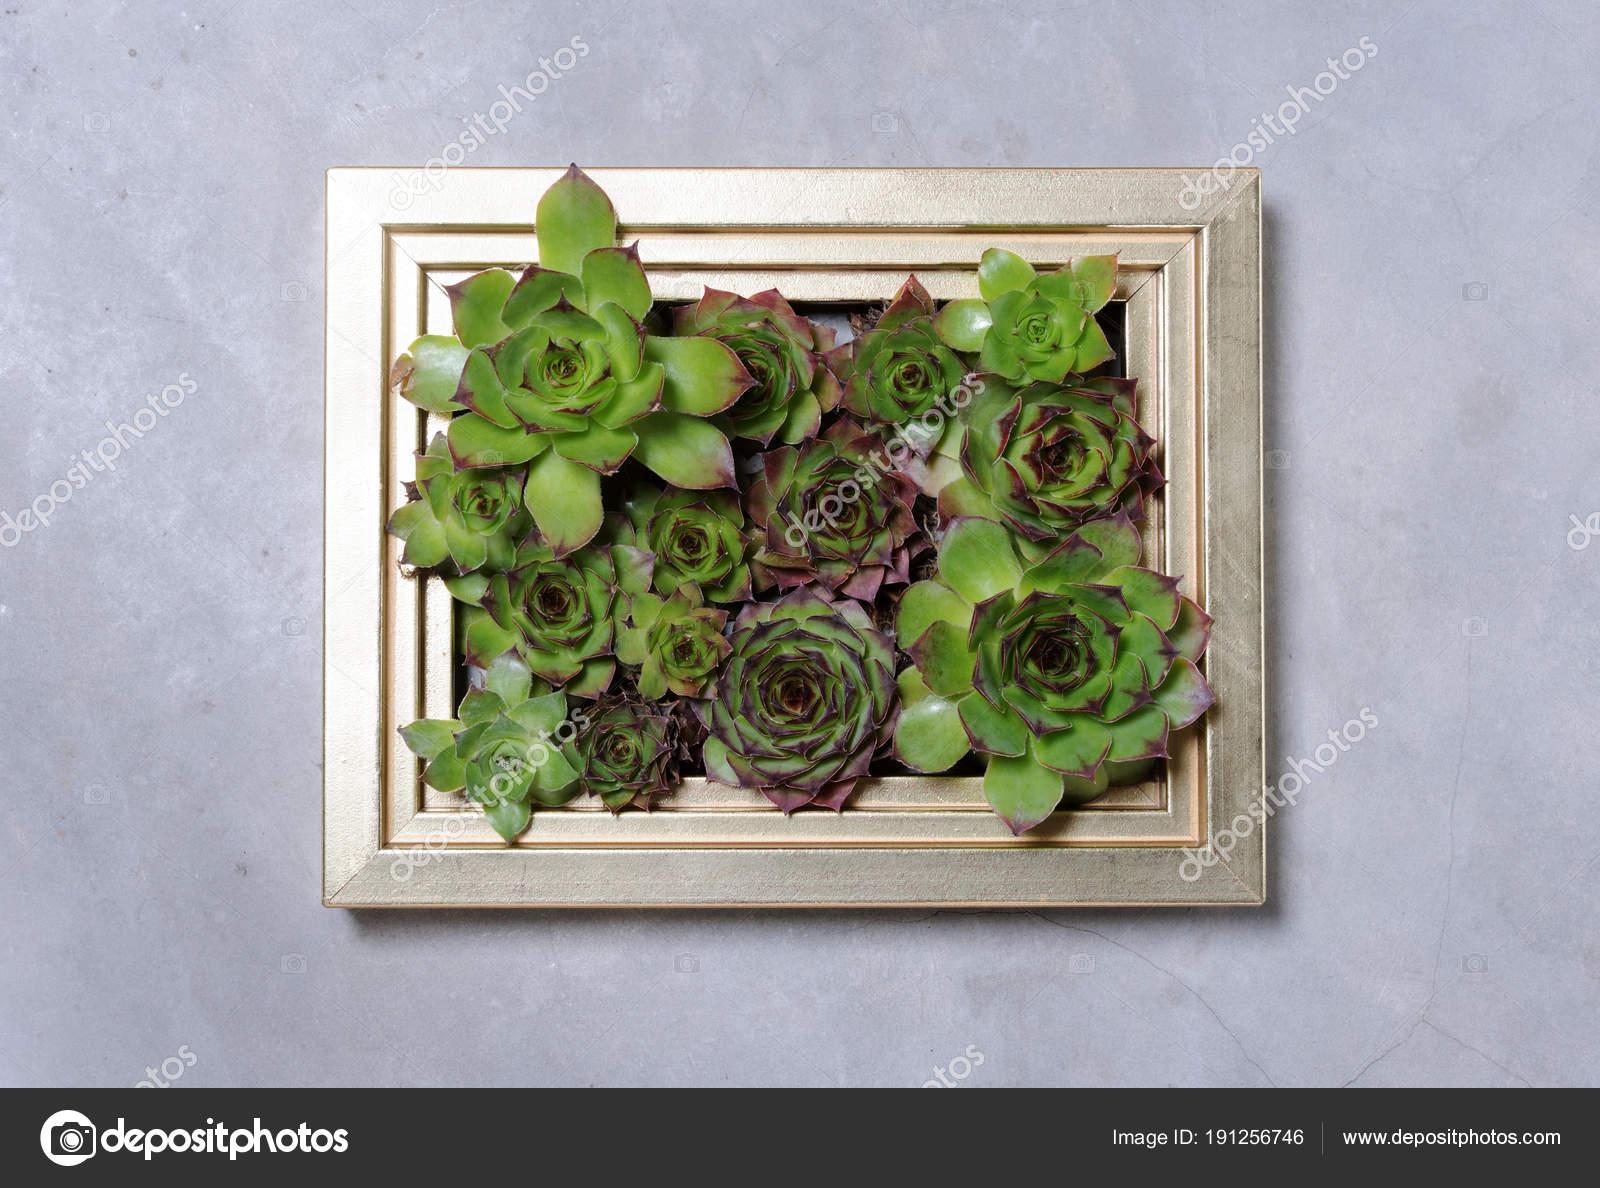 Sukkulente Pflanzen Dekoration Auf Graue Wand Stockfoto